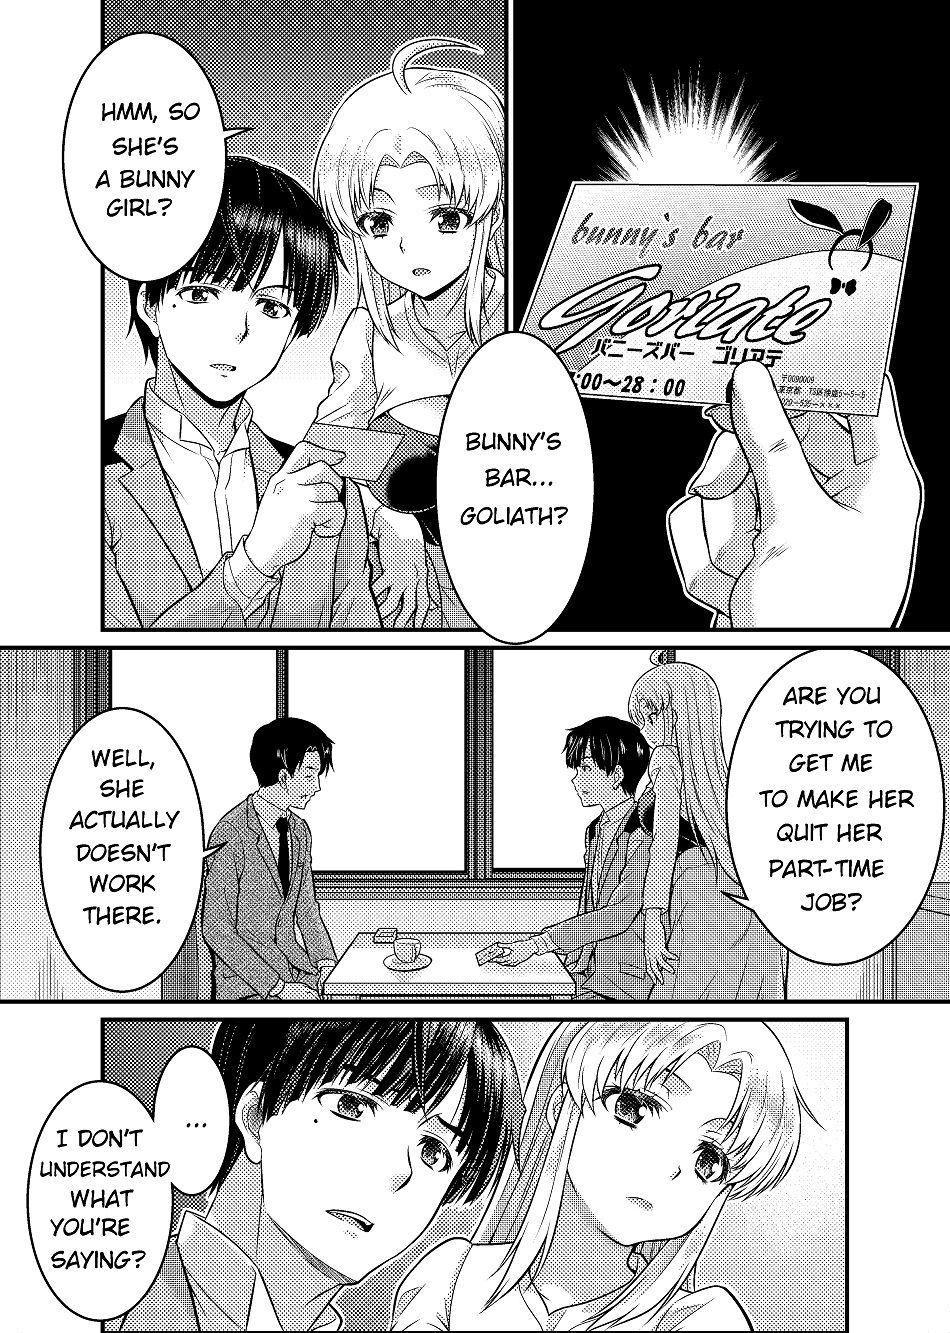 TS Detective Niizuma Hiromi Investigate the missing college student case! Dreadful Bunny Girl5